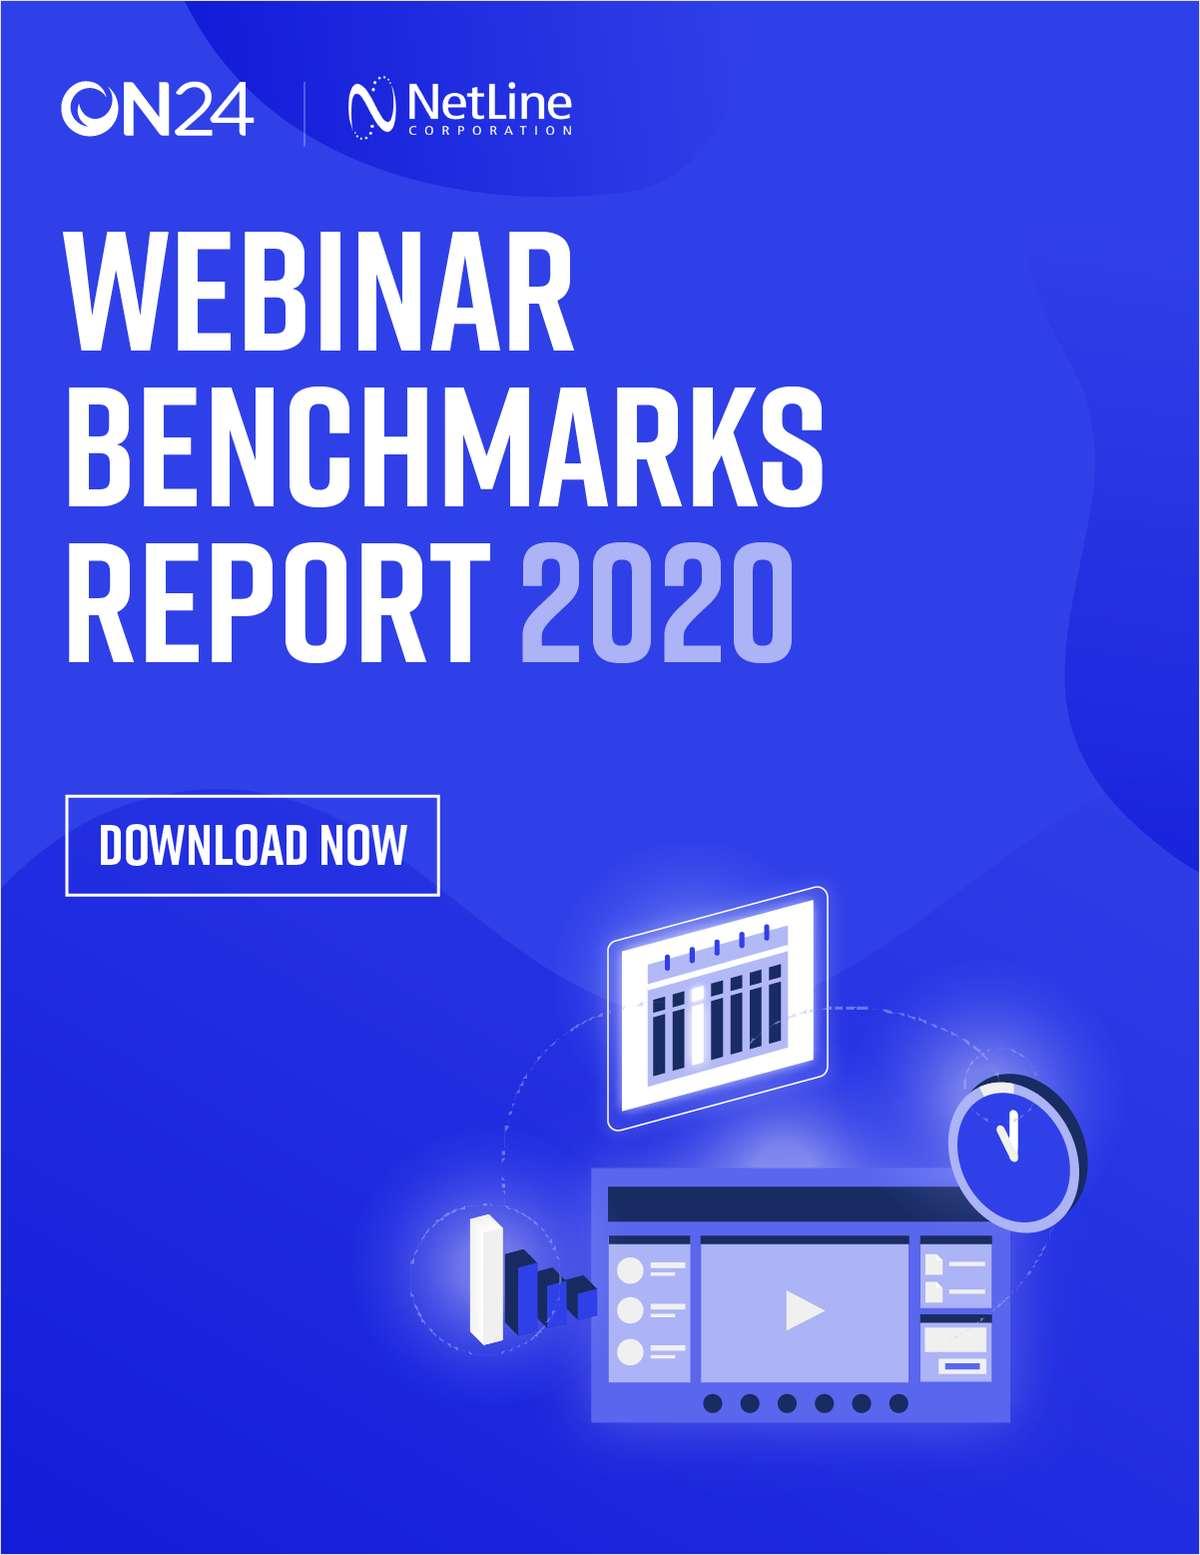 Webinar Benchmarks Report 2020